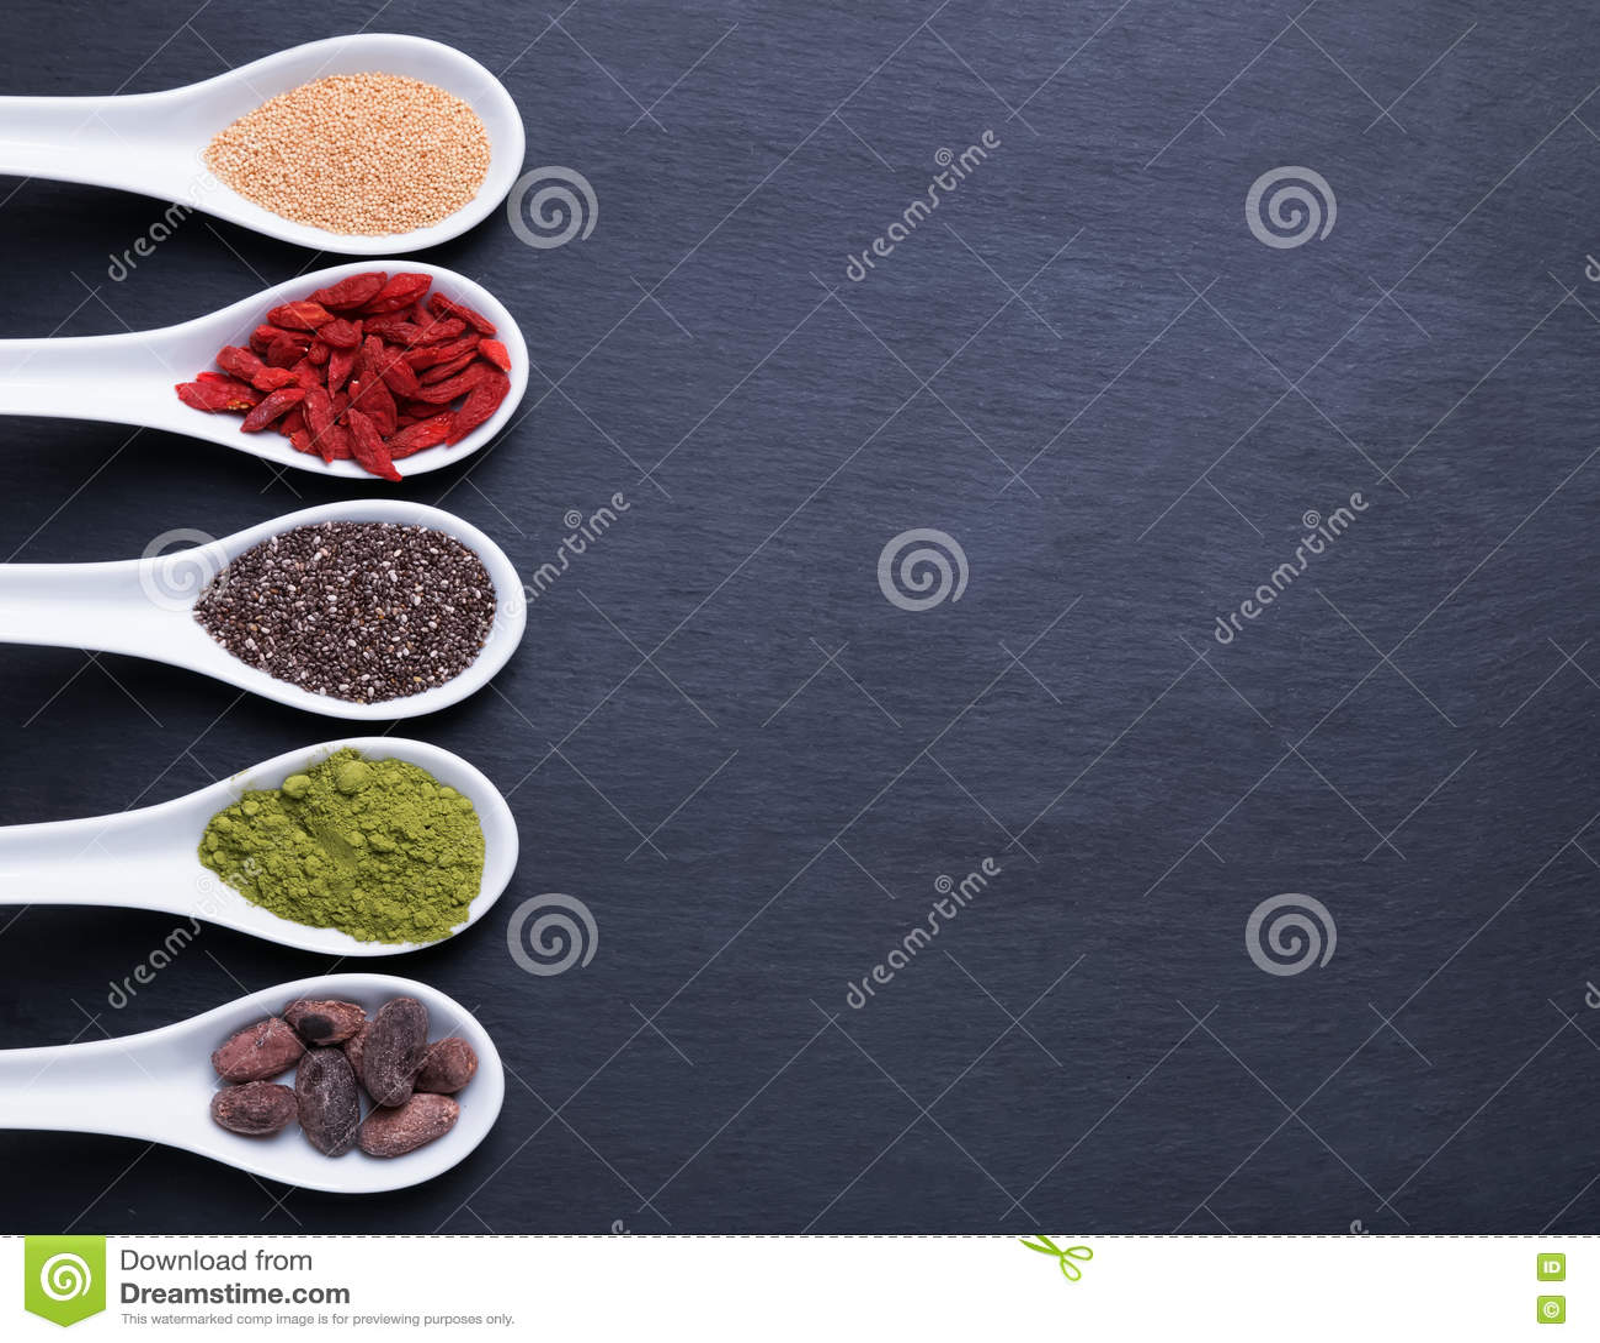 Super foods in spoons